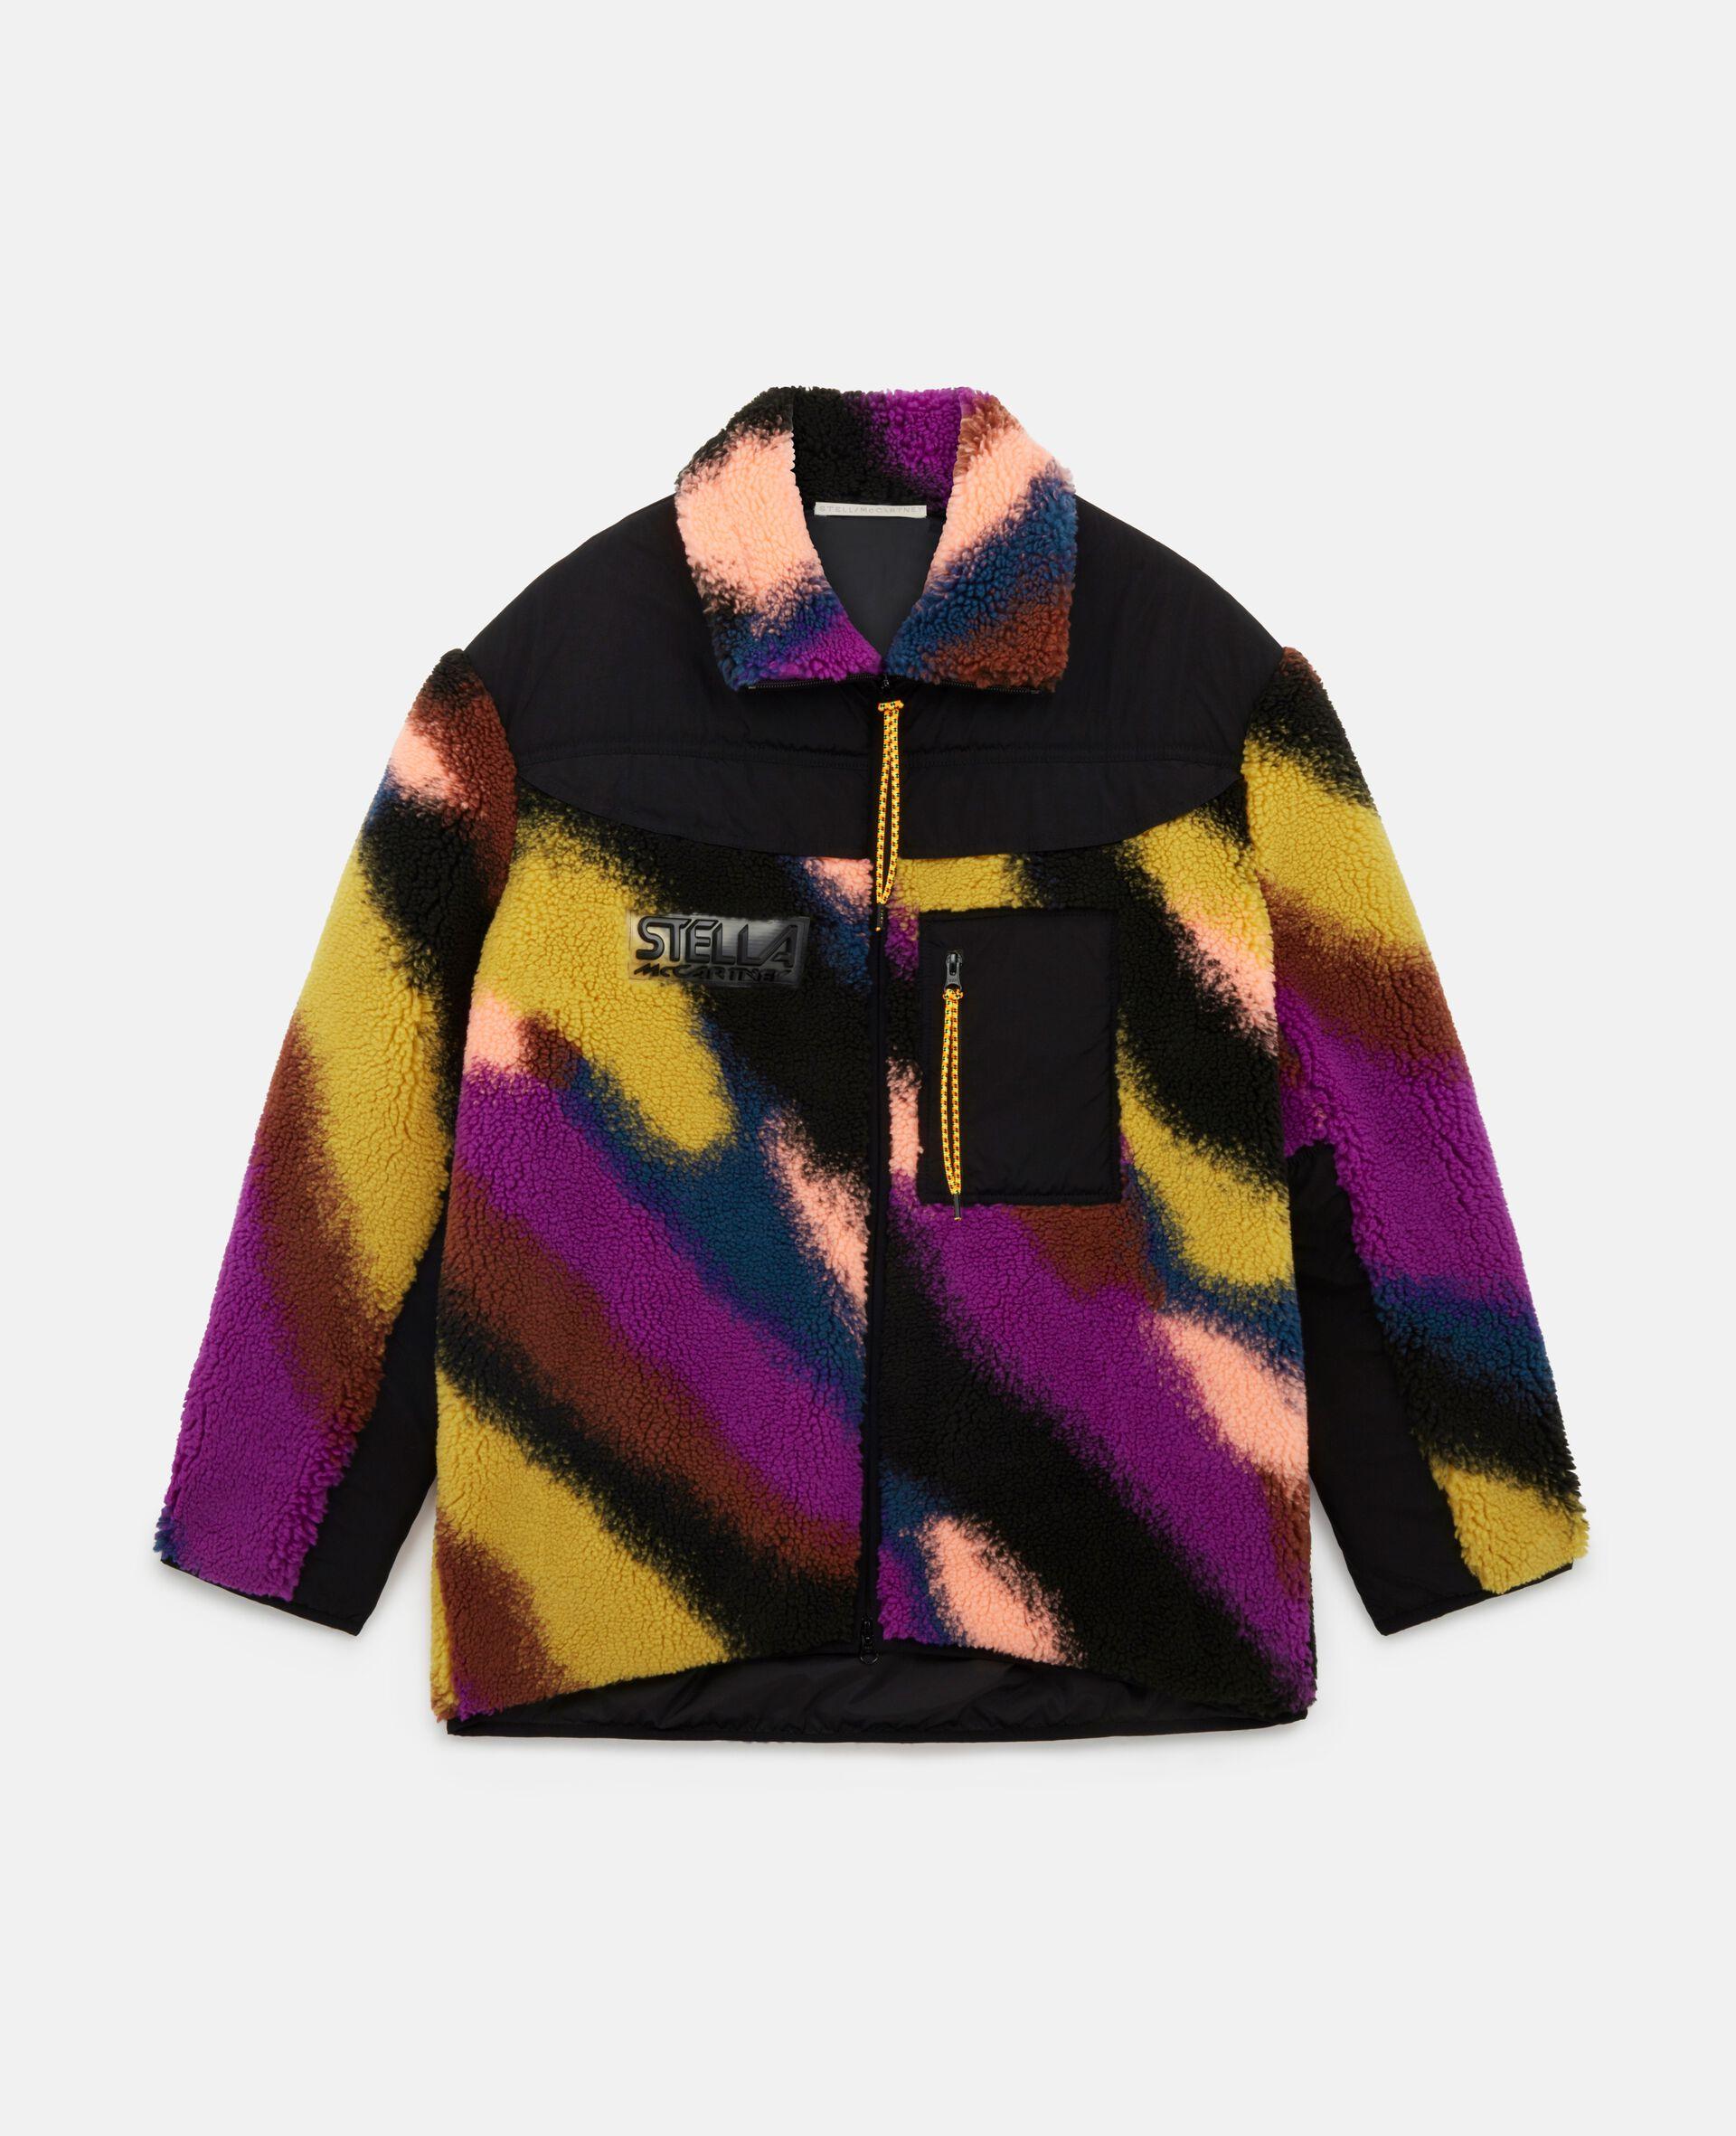 Marley Jacquard Teddy Mat Jacket-Multicolour-large image number 0